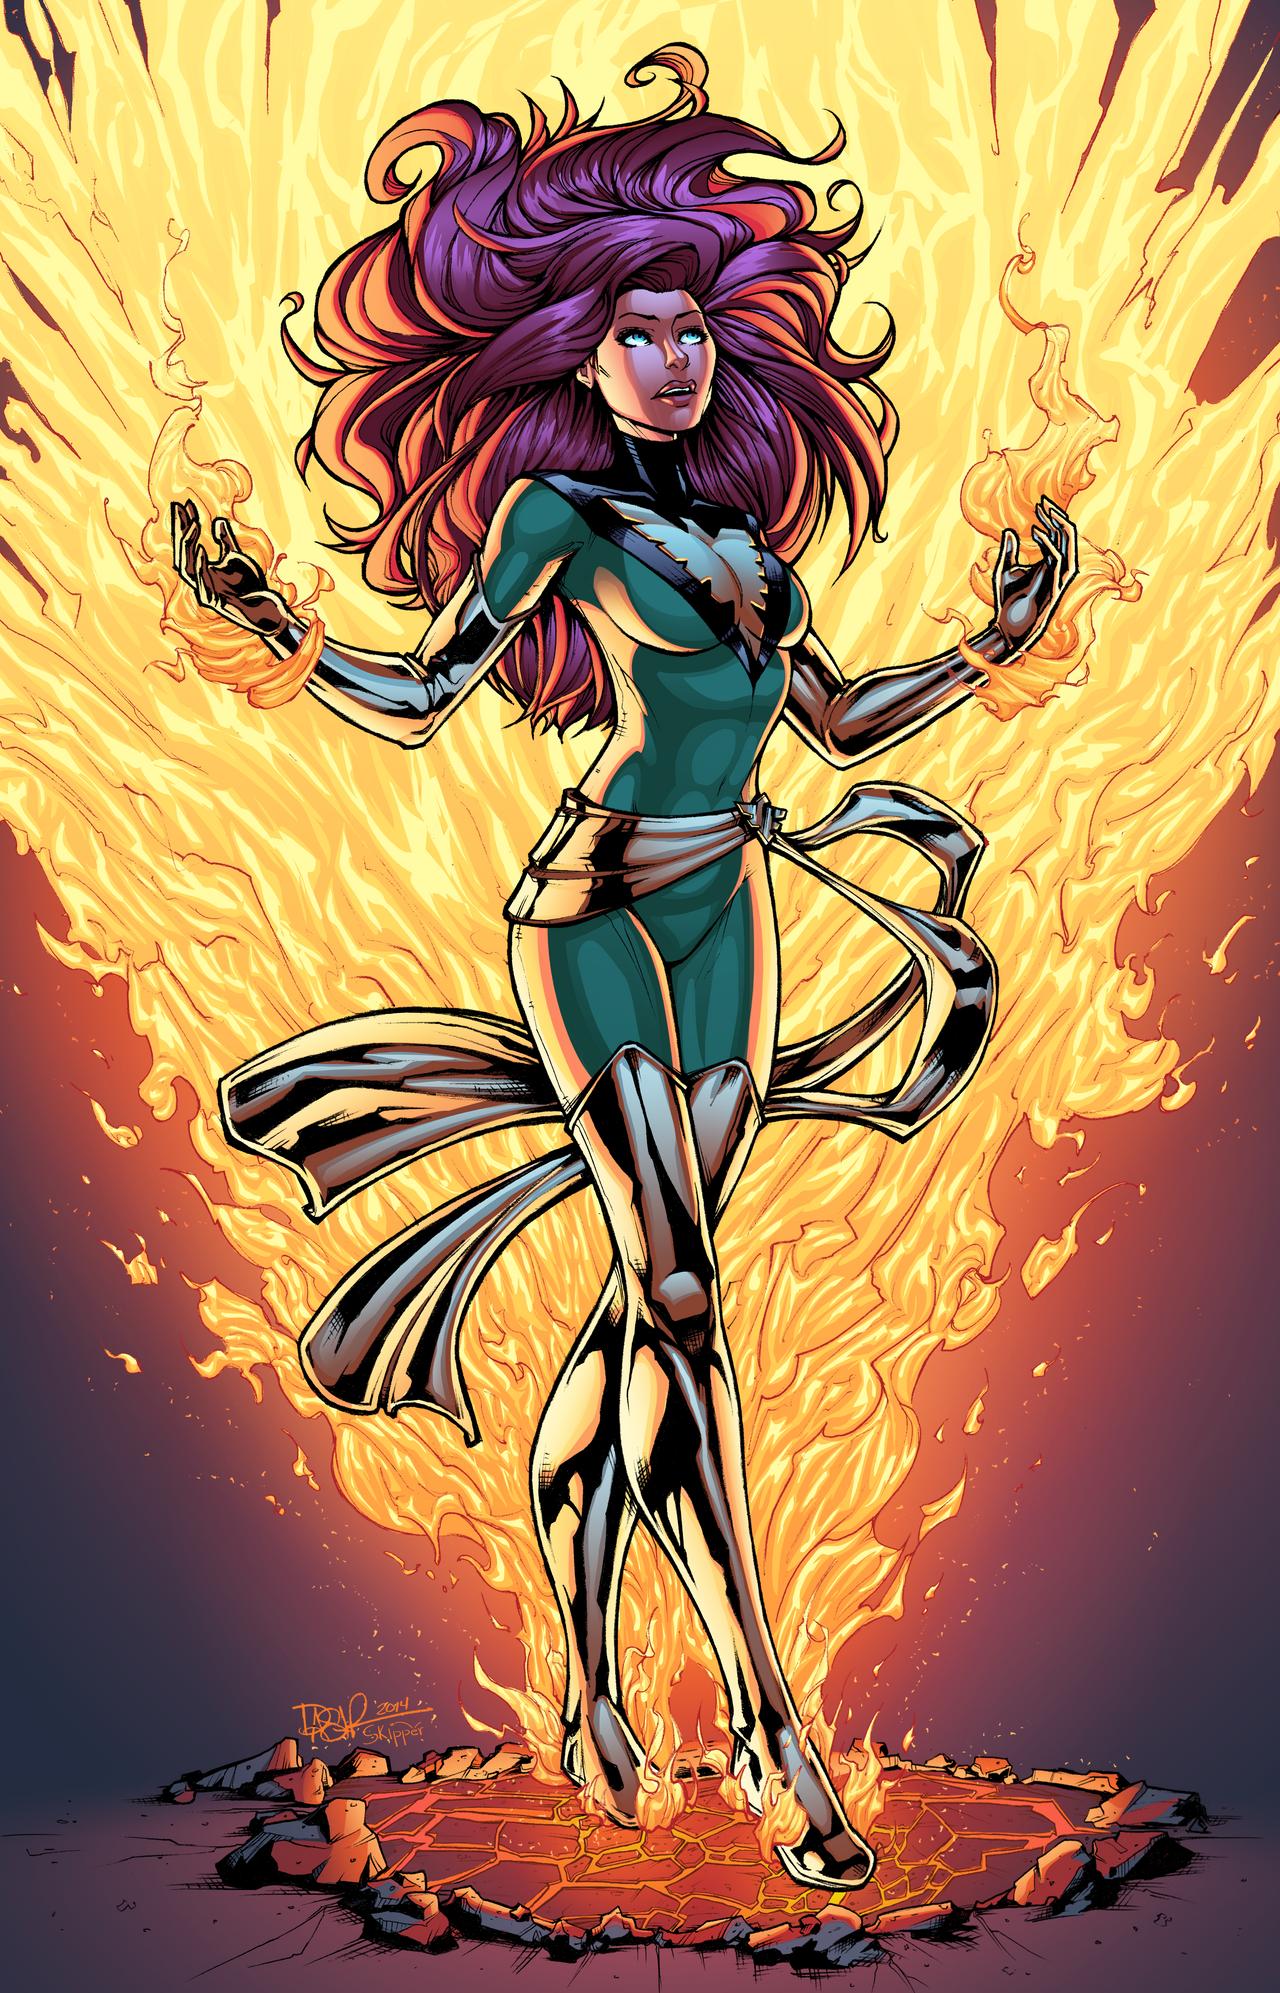 Phoenix rises by j skipper on deviantart - Jean grey phoenix wallpaper ...